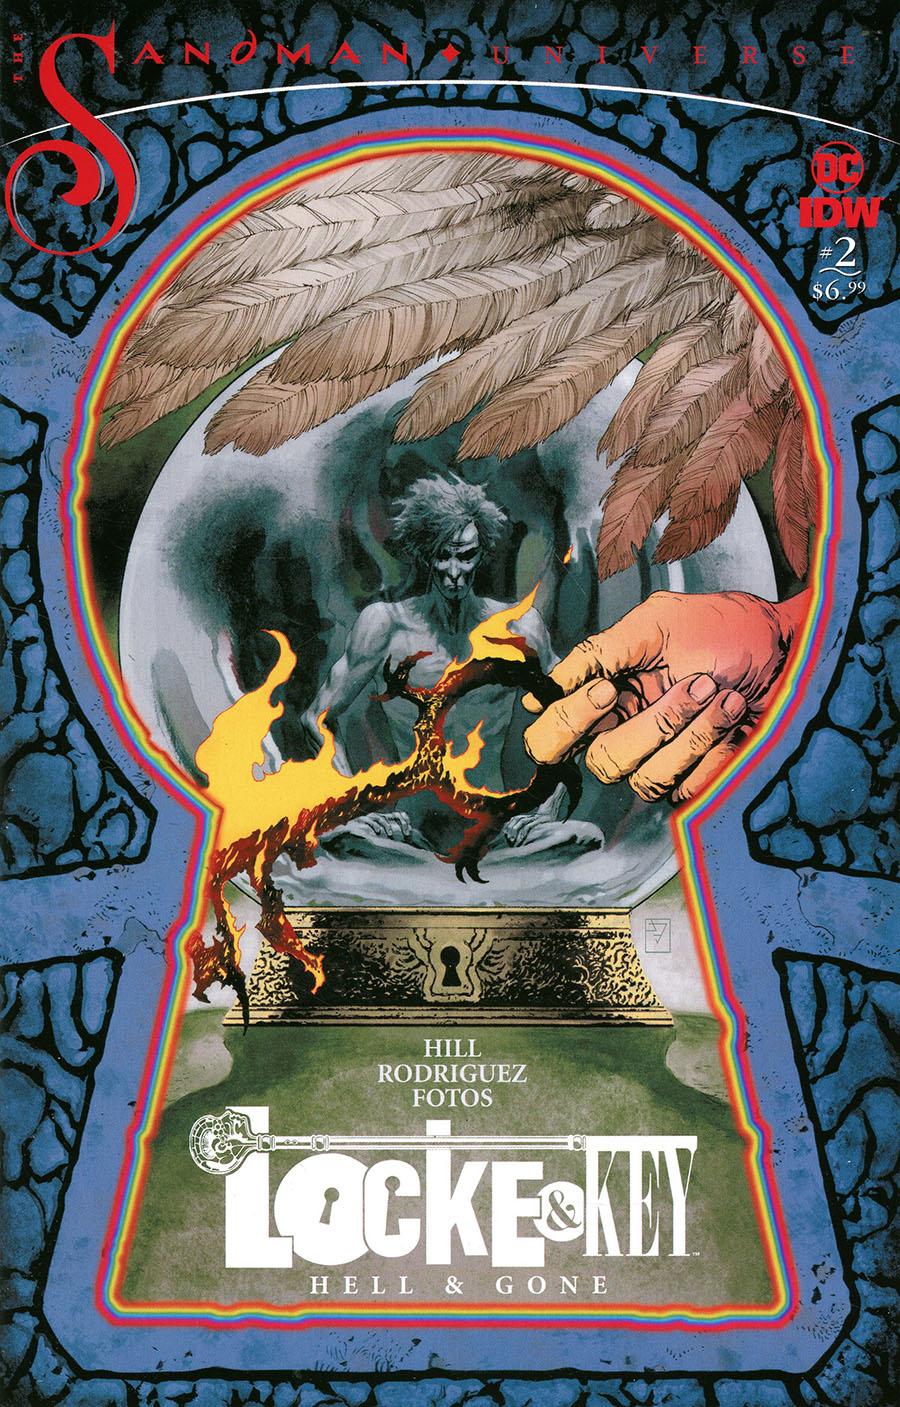 Locke & Key Sandman Hell & Gone #2 Cover B Variant JH Williams III Cover